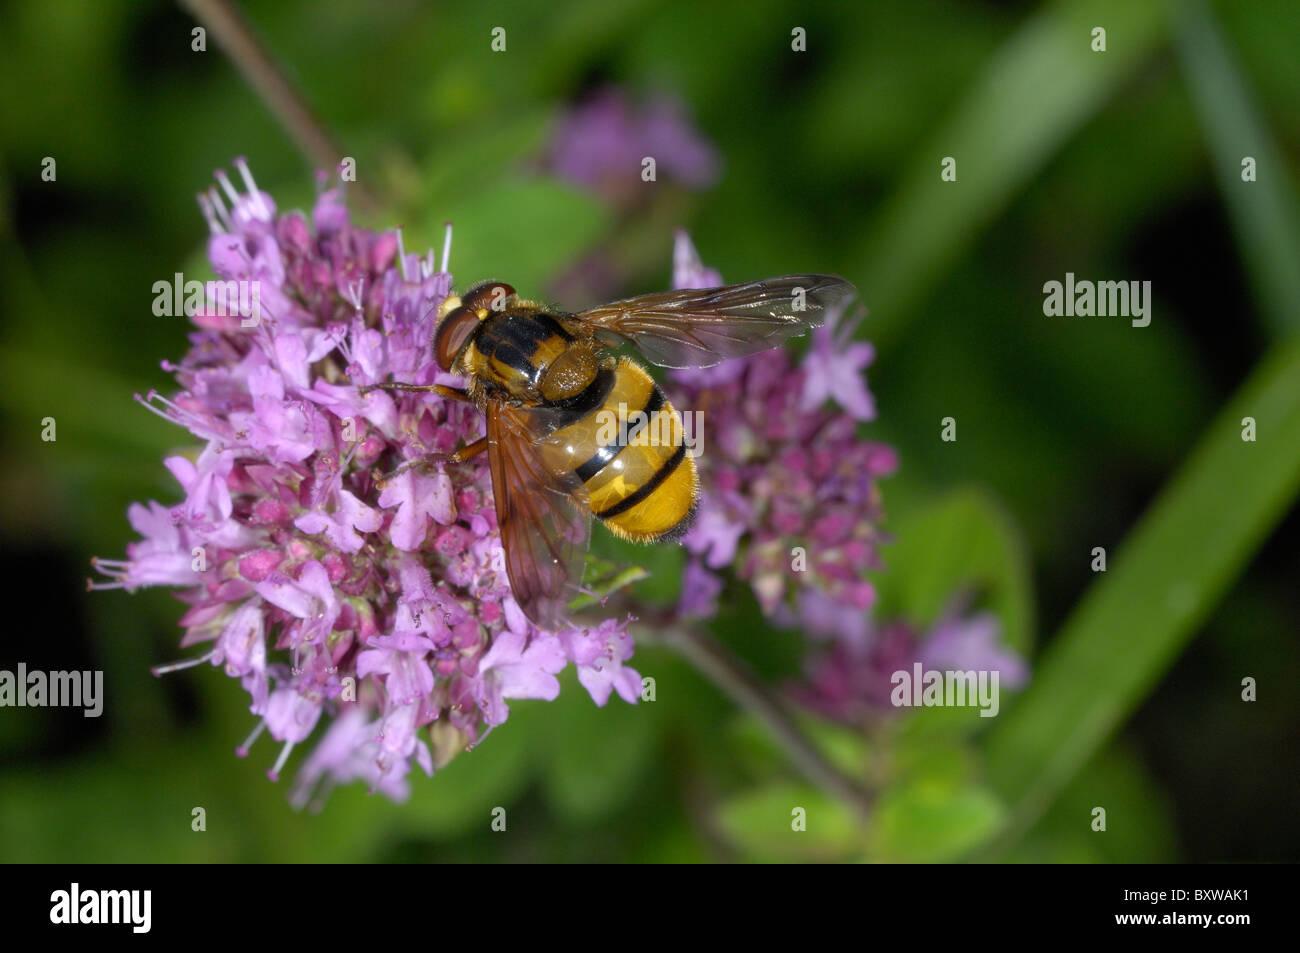 Hover-fly (Volucella species) feeding on marjoram flowers, Oxfordshire, UK. - Stock Image